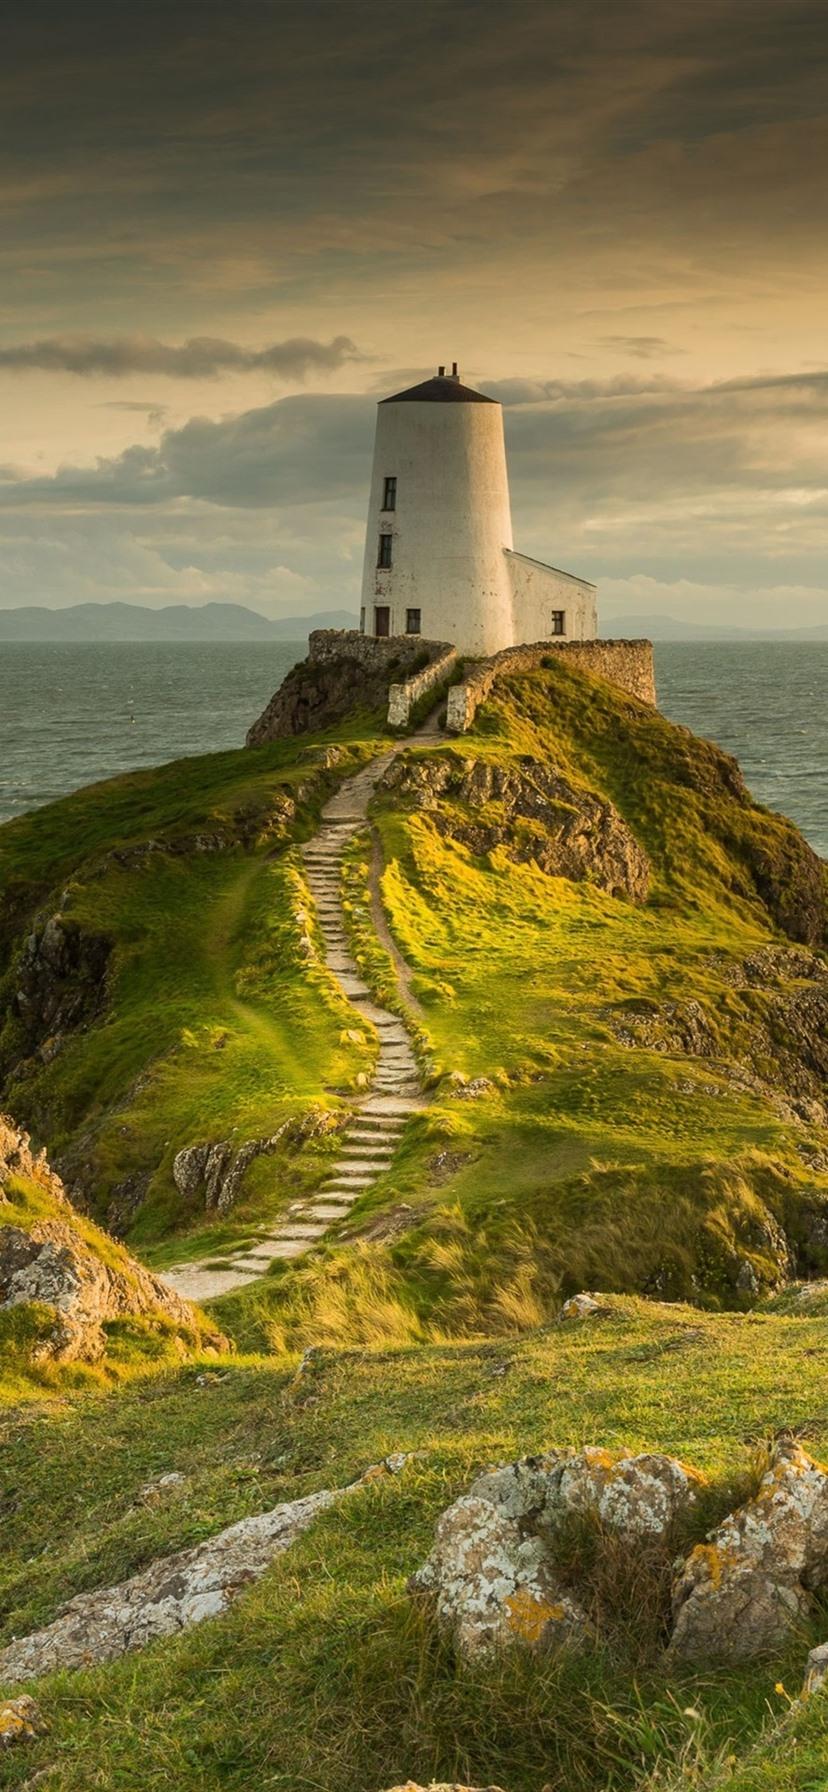 Lighthouse Sea Grass 1080x1920 Iphone 8 7 6 6s Plus